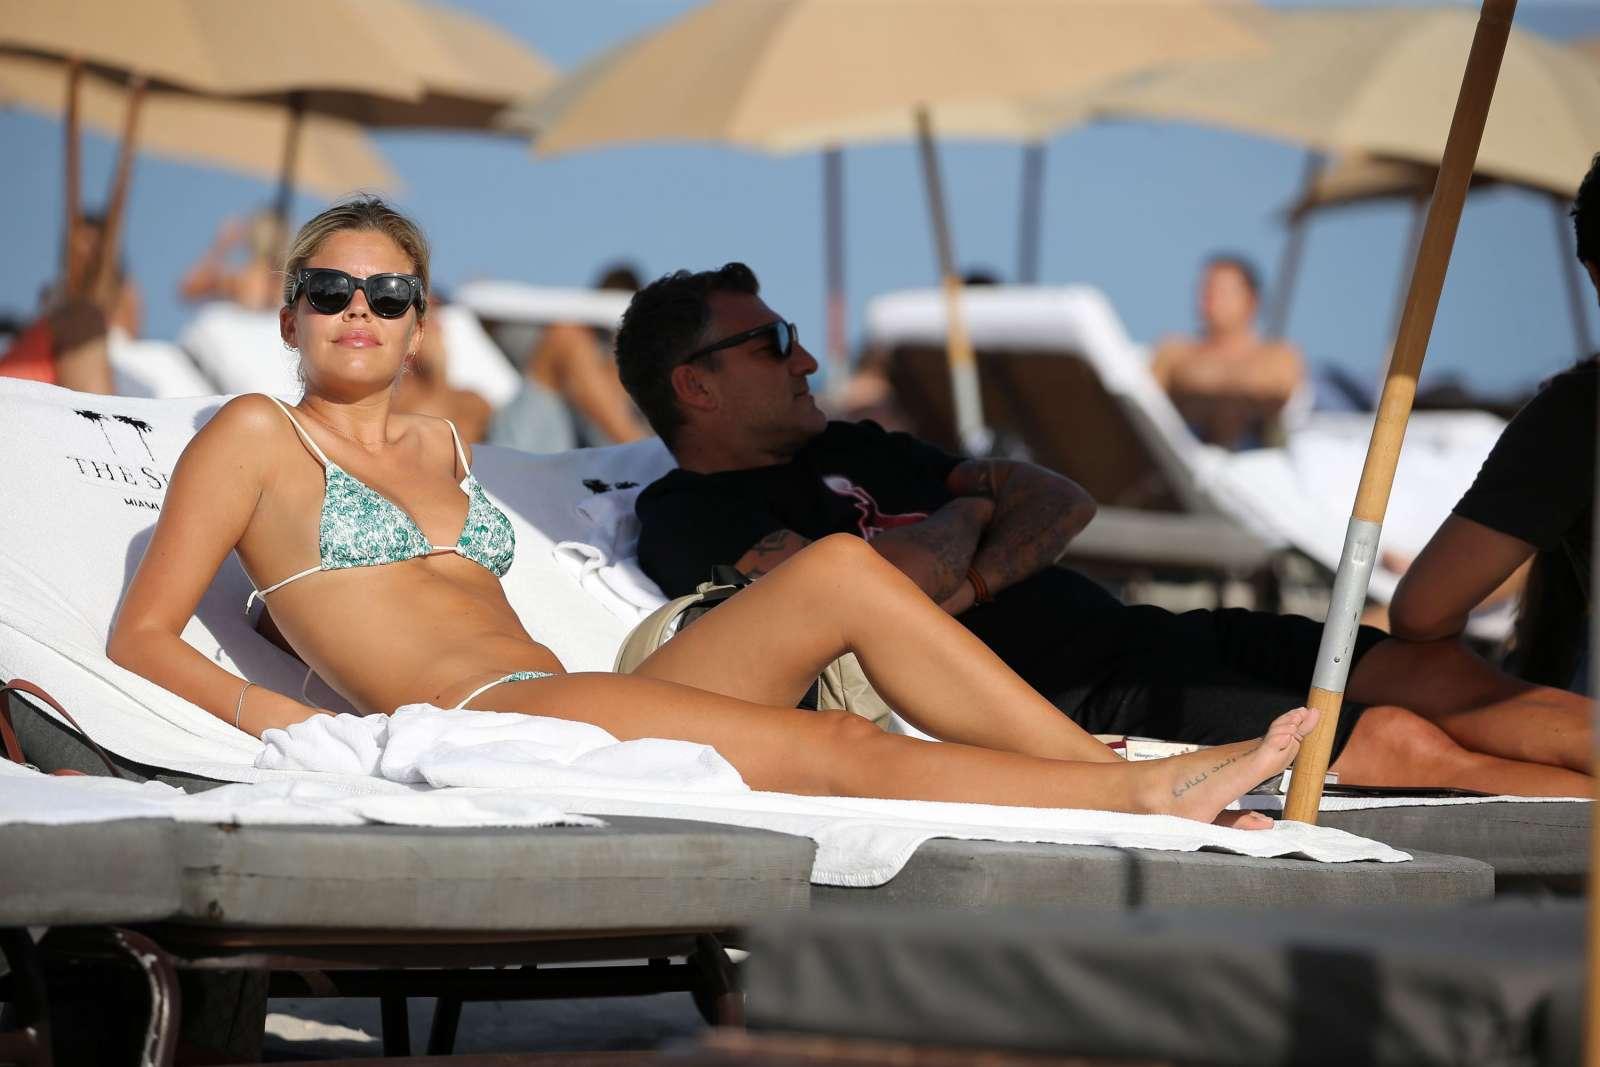 Constance Caracciolo 2017 : Constance Caracciolo in Bikini Sunbathing -29